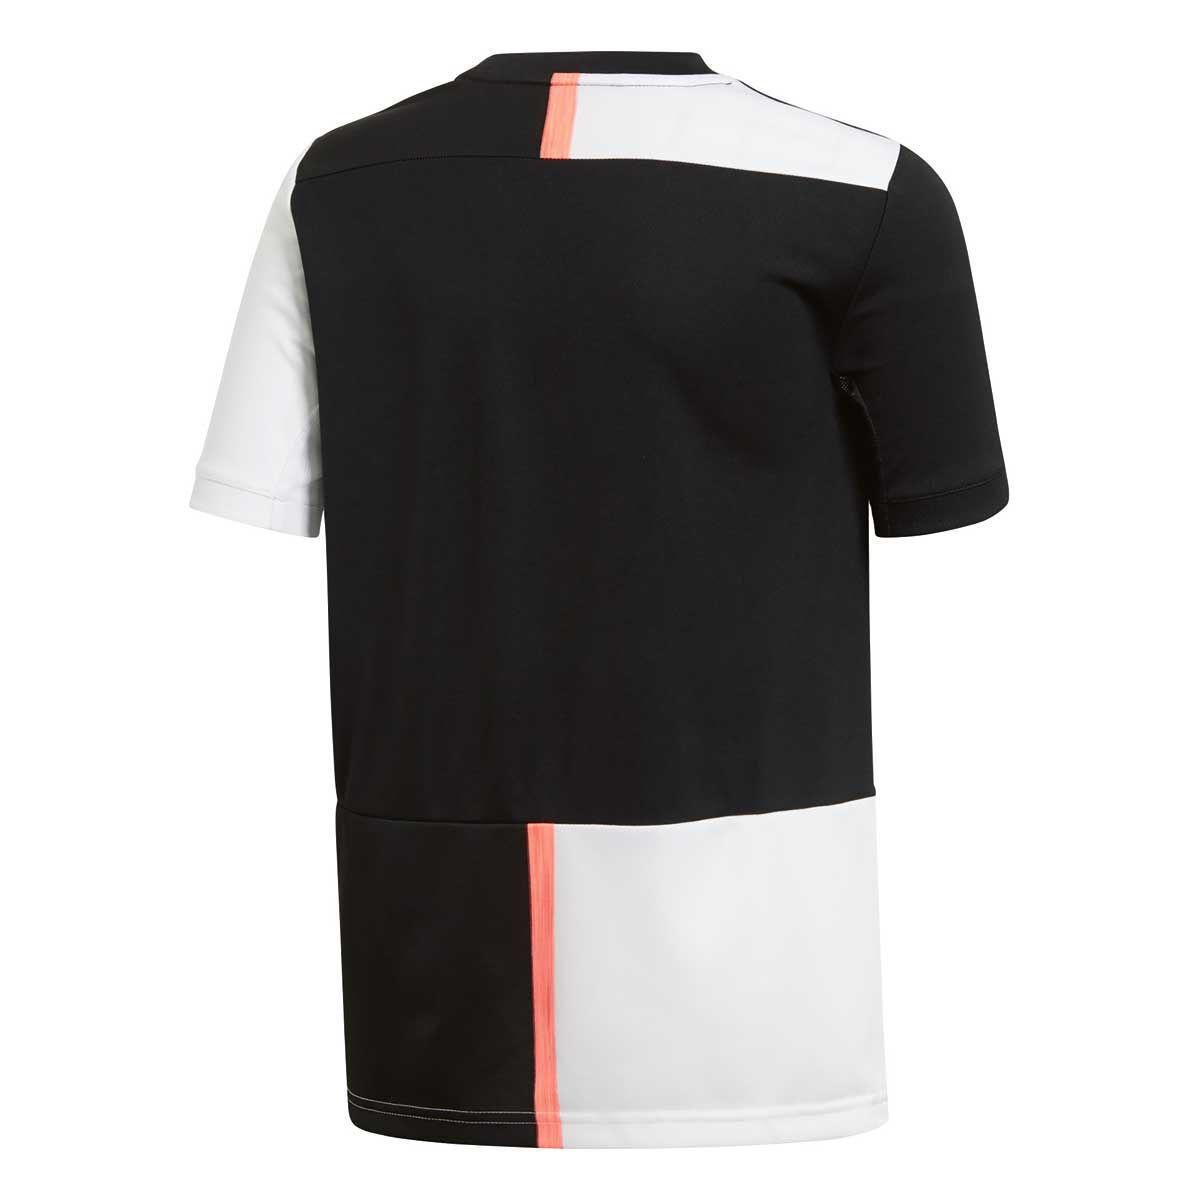 FC Juventus Adidas Sport Jacket 2019 20 Track Top 3 Stripes Men White black